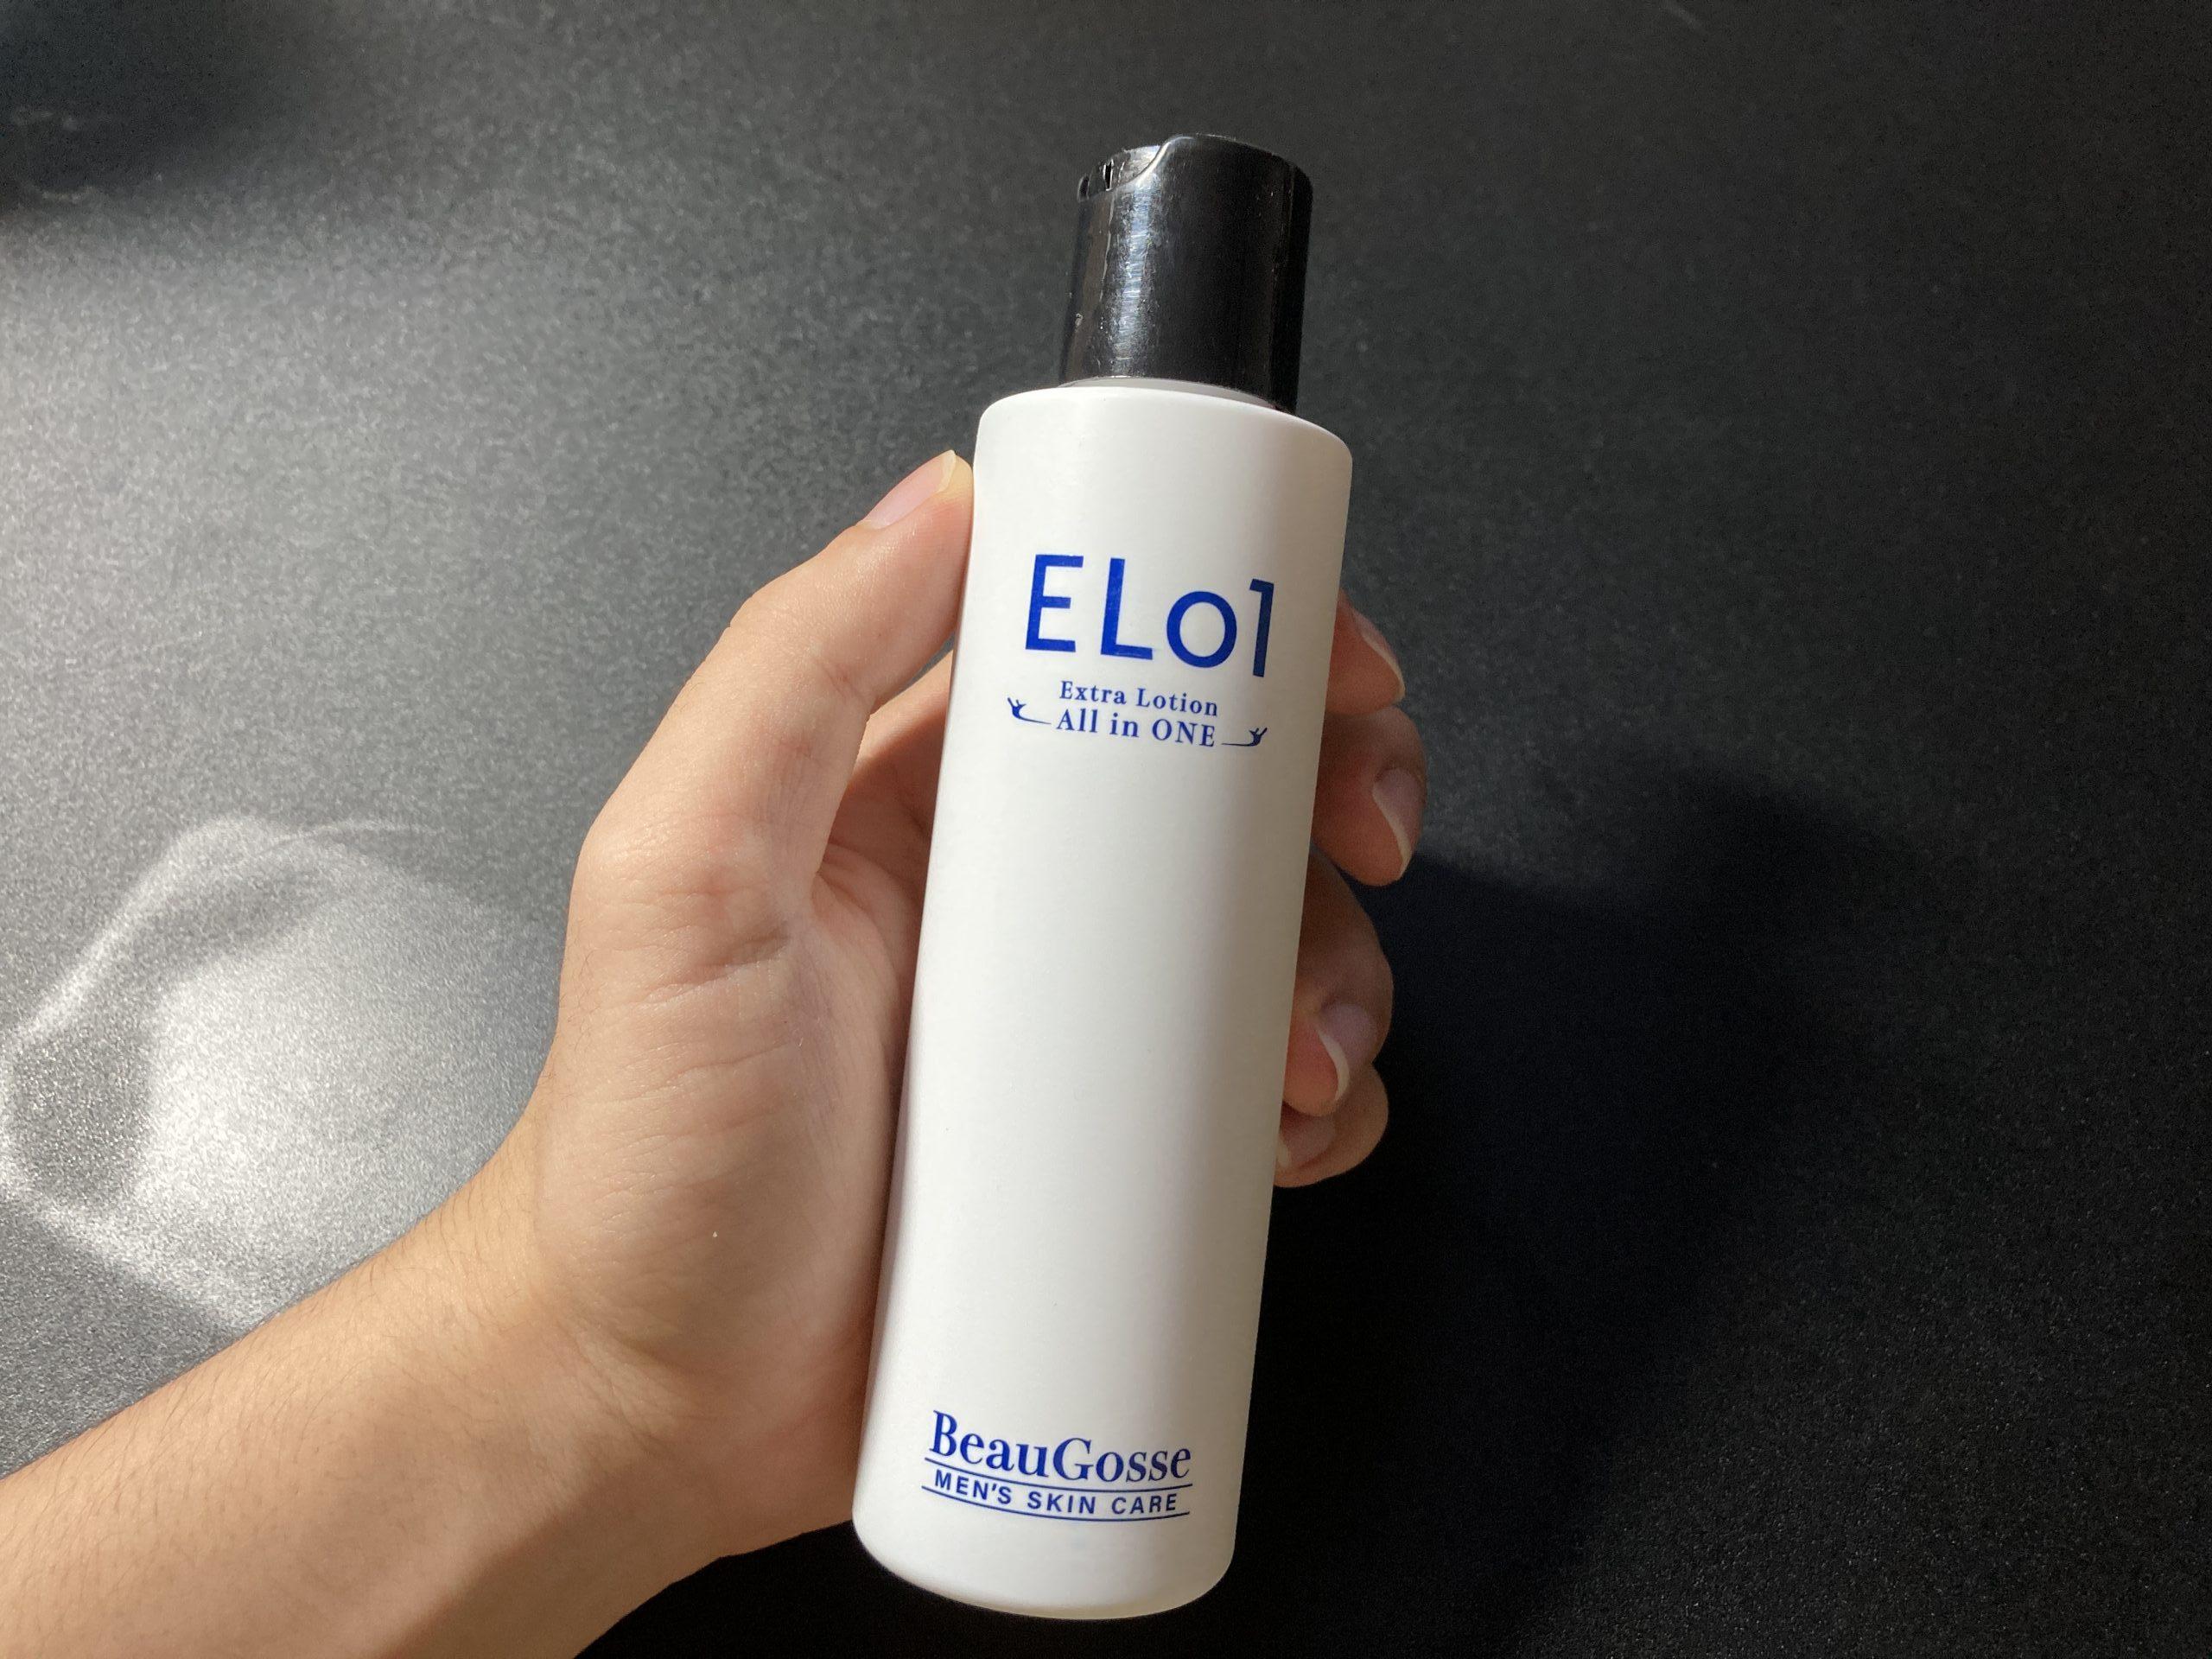 ELo1 年齢肌 メンズ エイジングケア